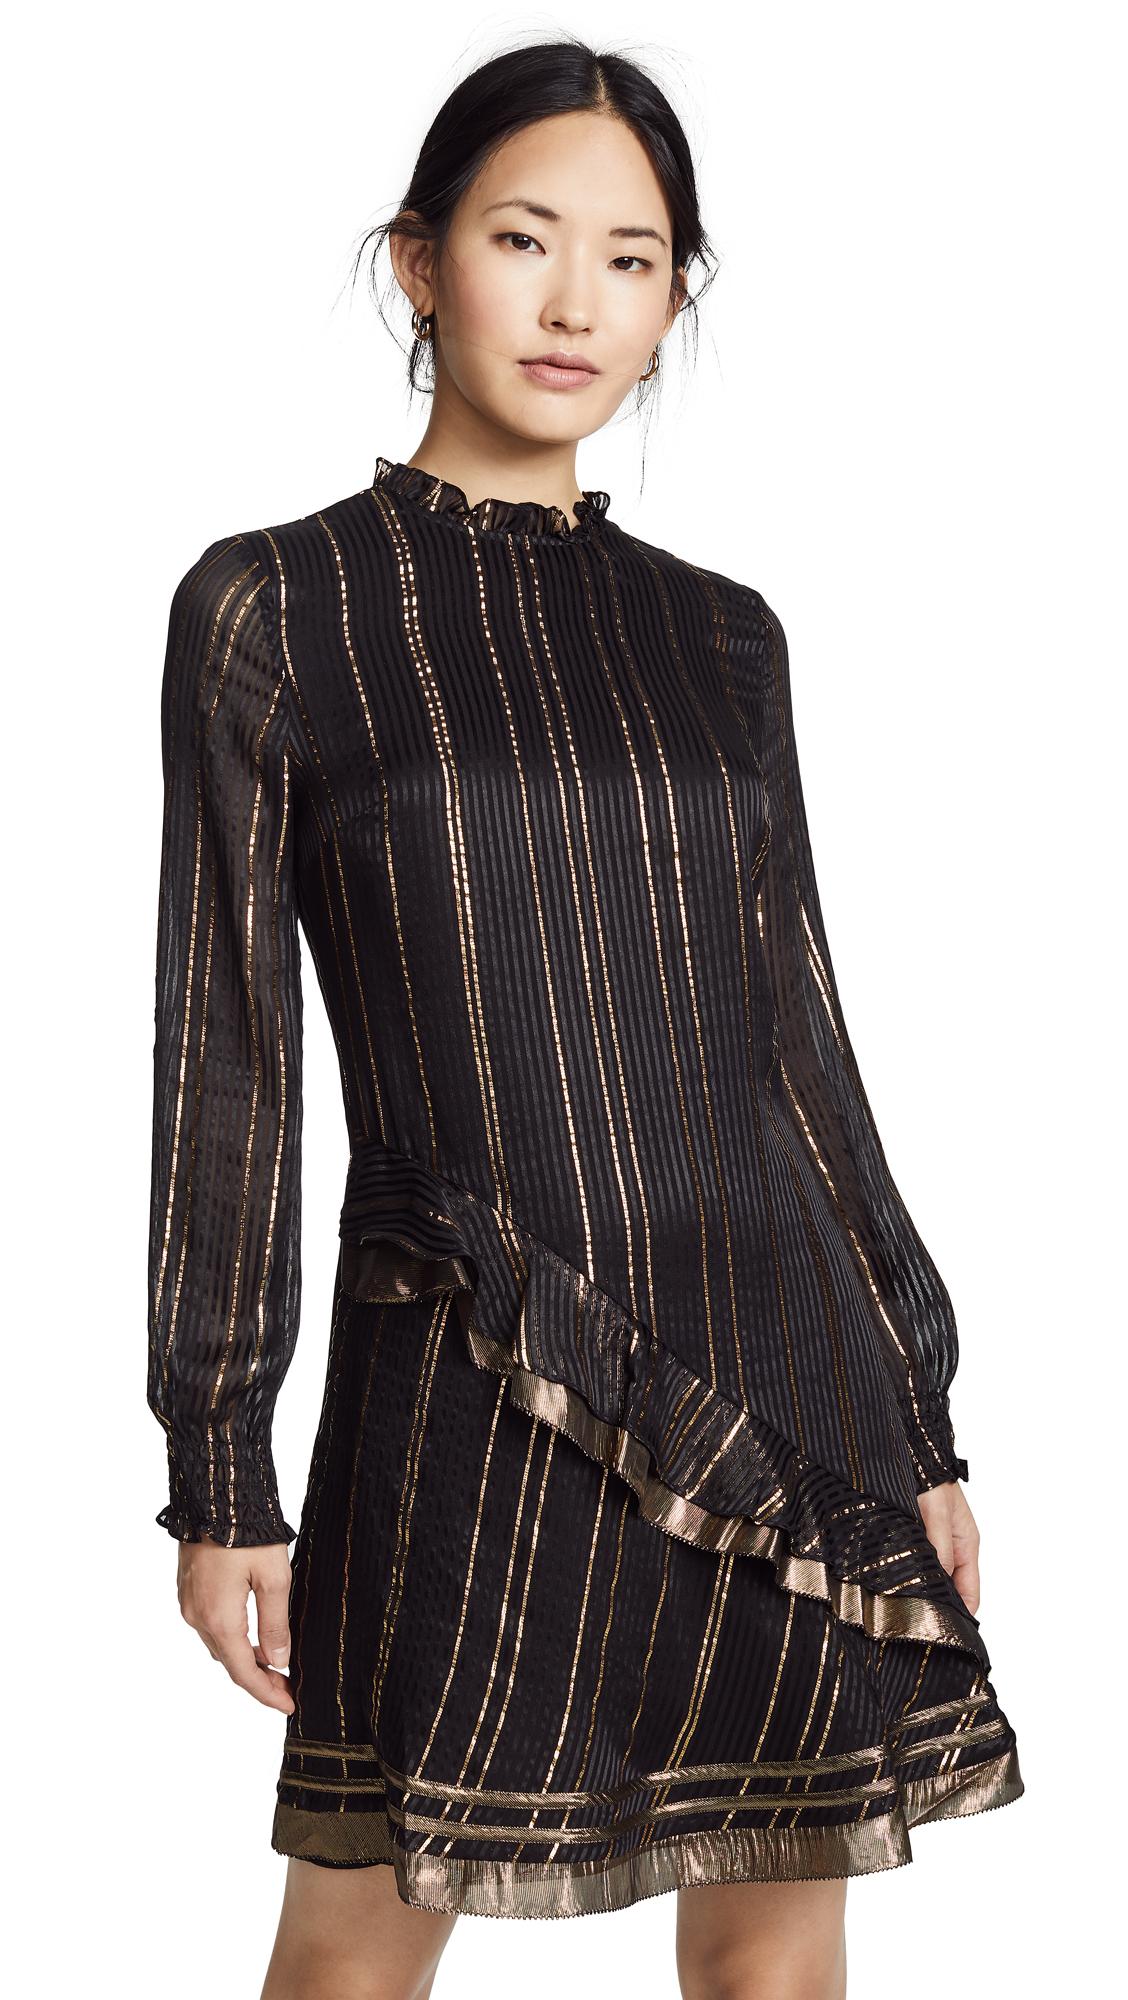 Derek Lam 10 Crosby Ruffle Collar Dress - Black